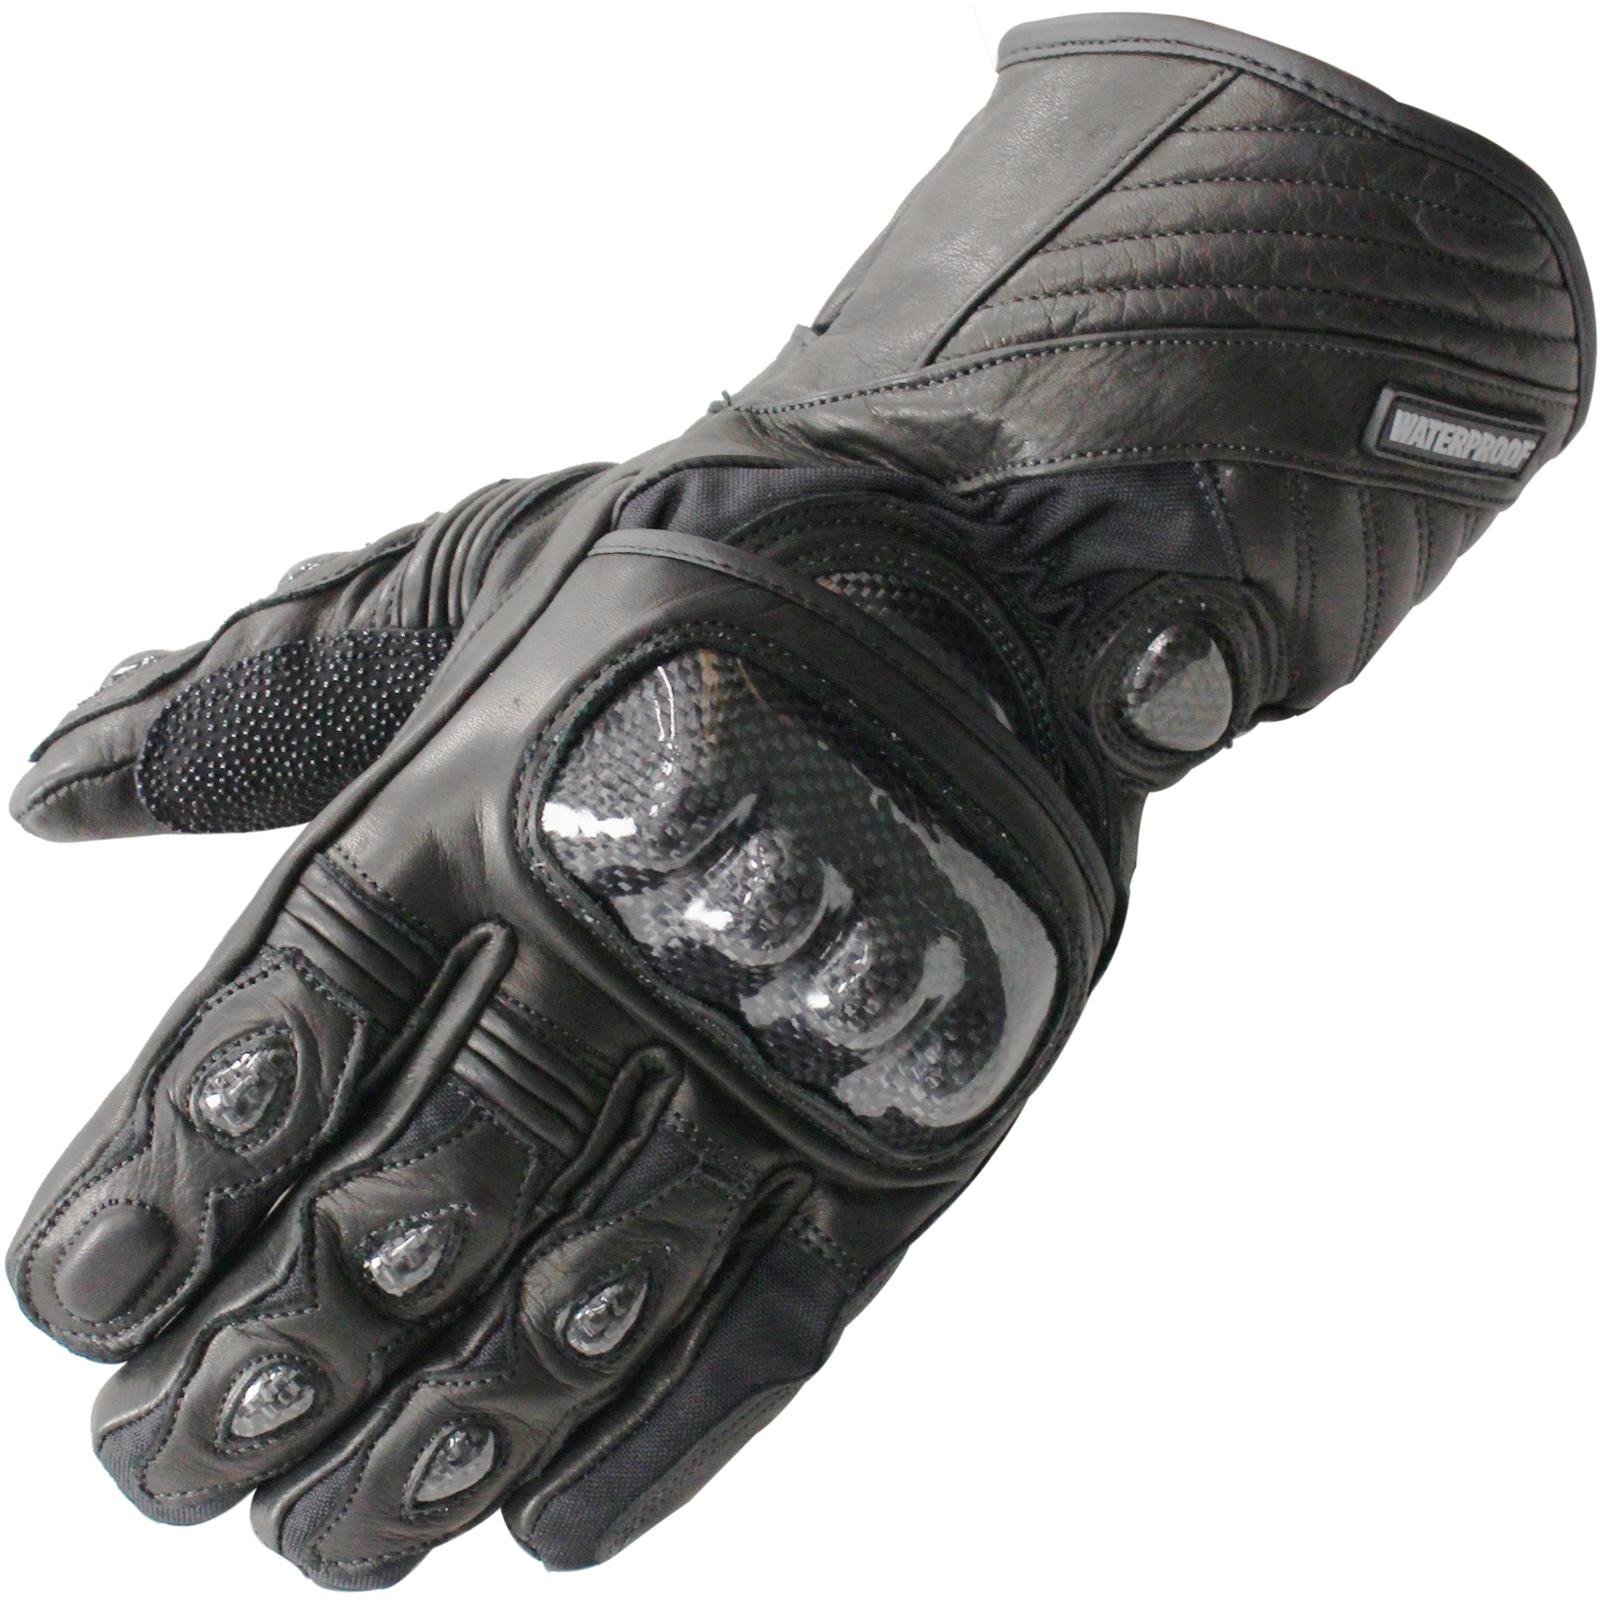 Photography DIY /& Work Wear. Specialist Gardening Fold-Back Finger Tips Fishing Velcro Gloves